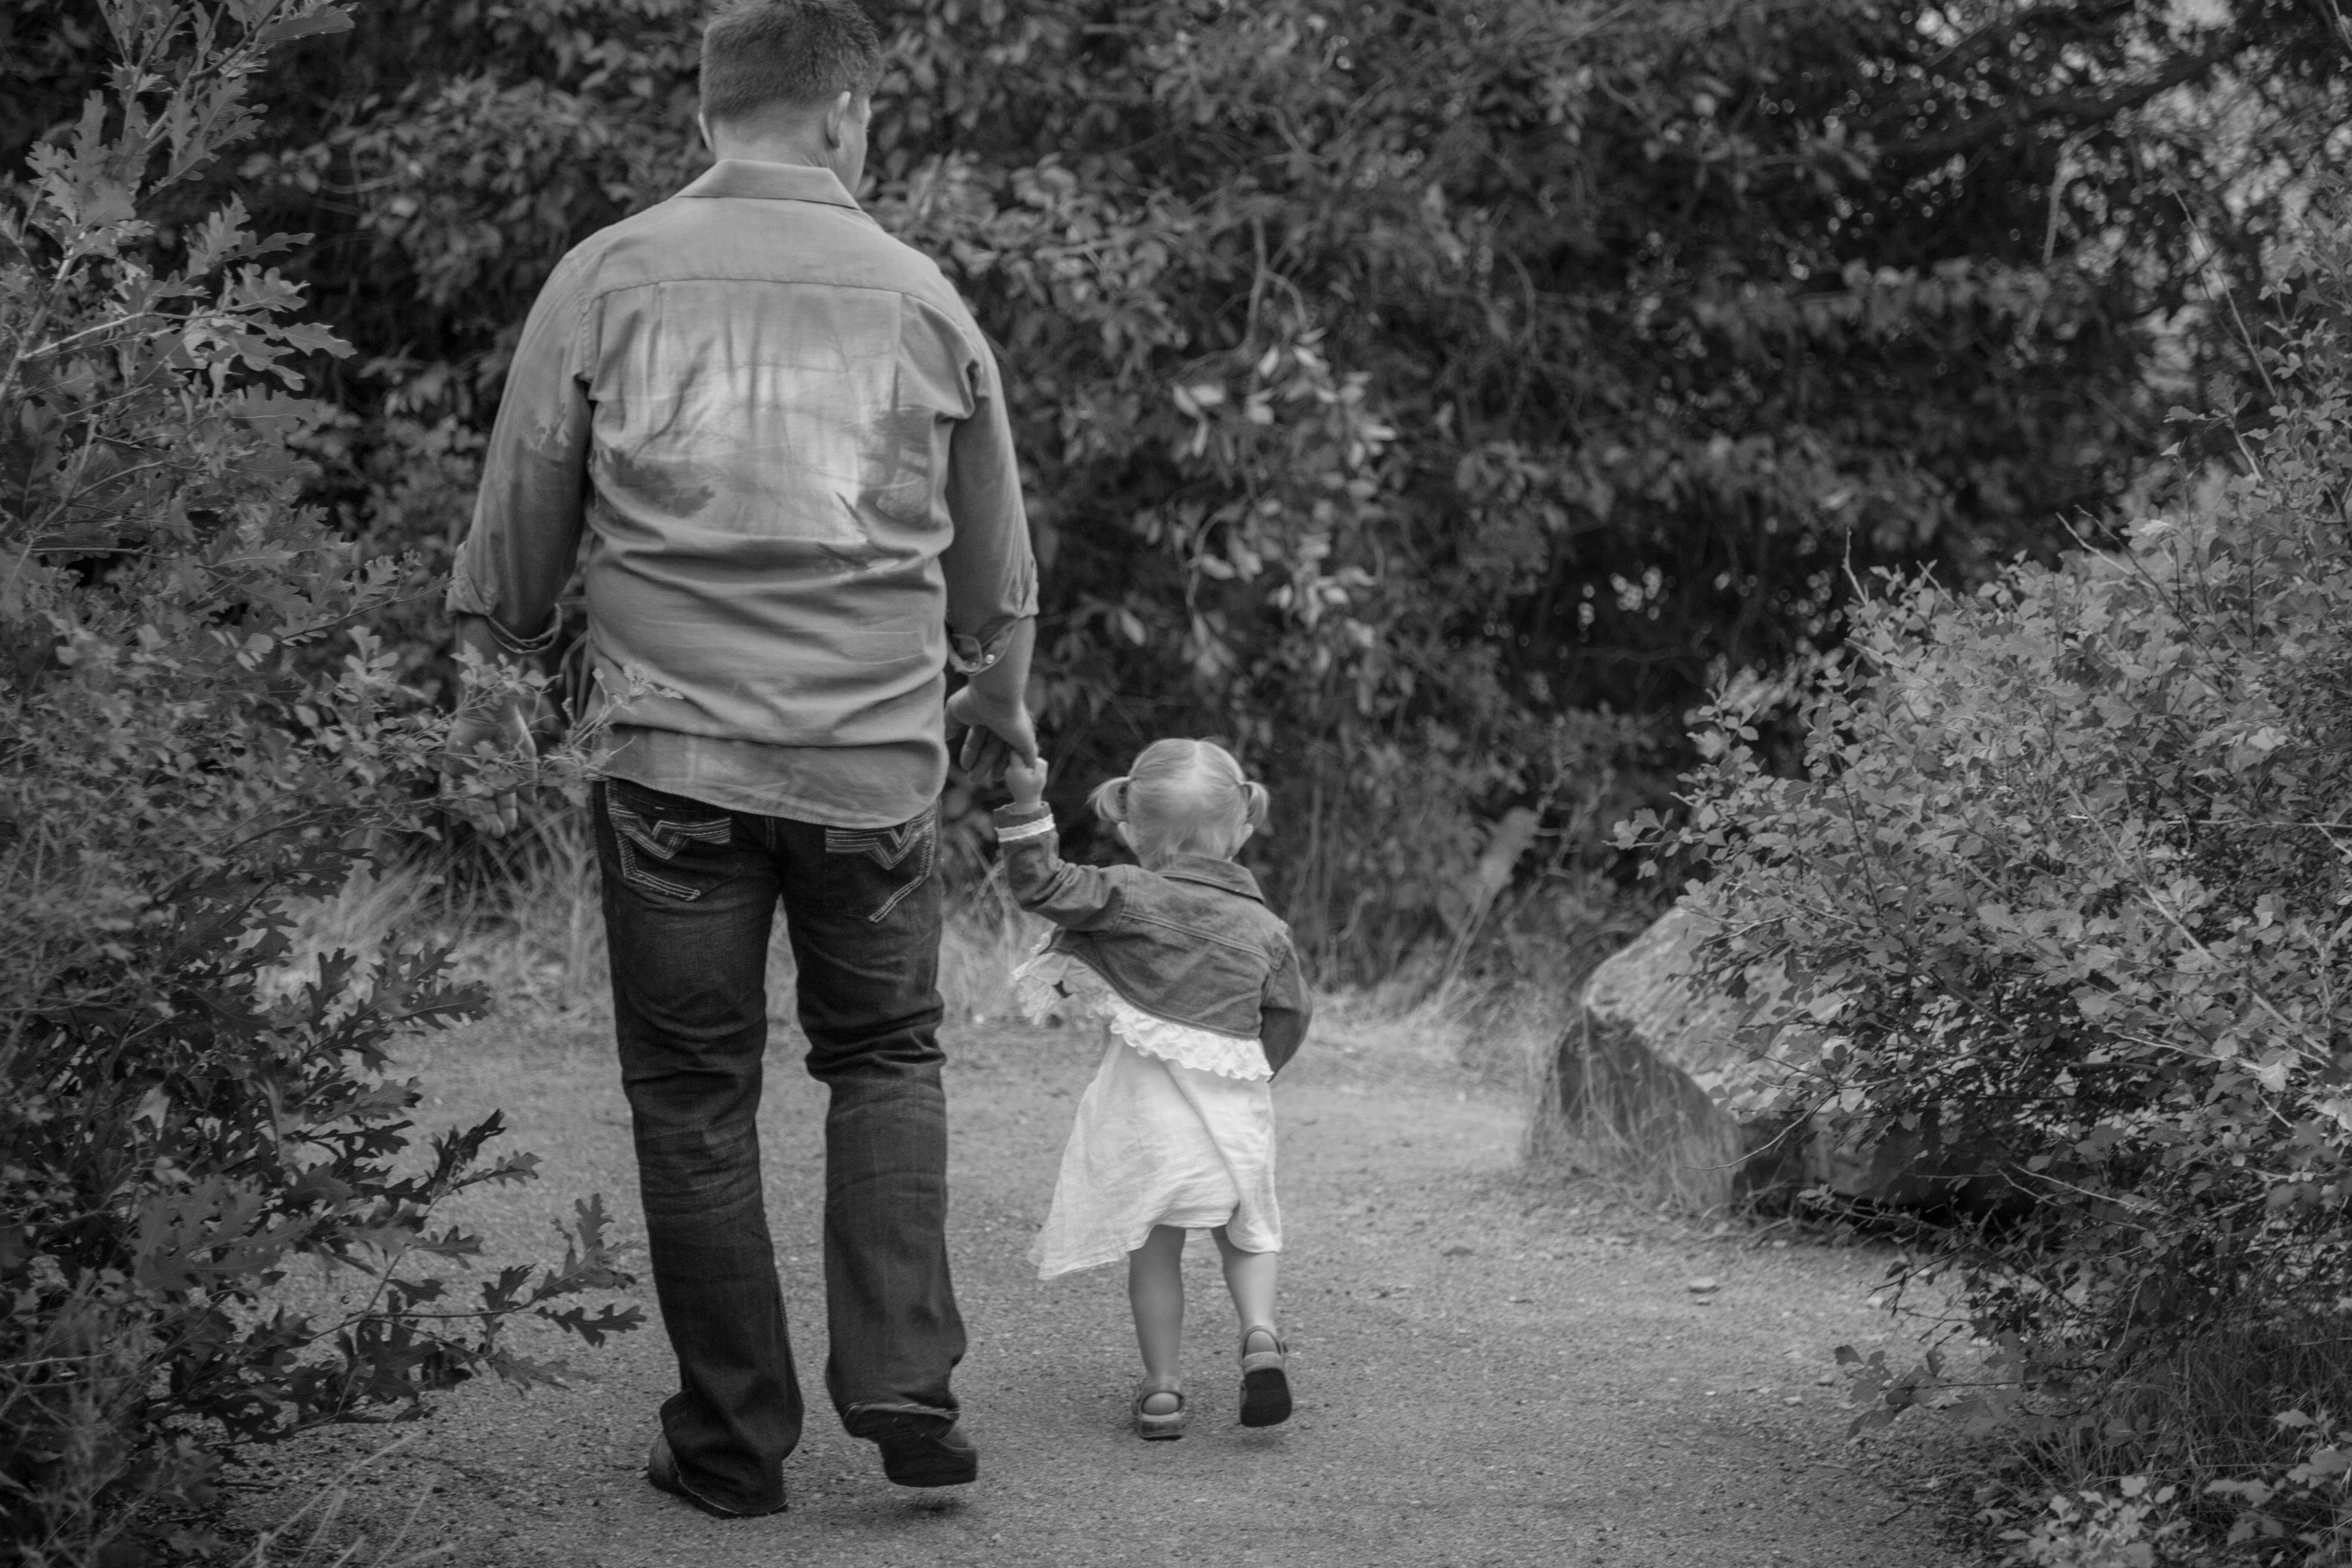 Free stock photo of b&w, baby, black and white, child